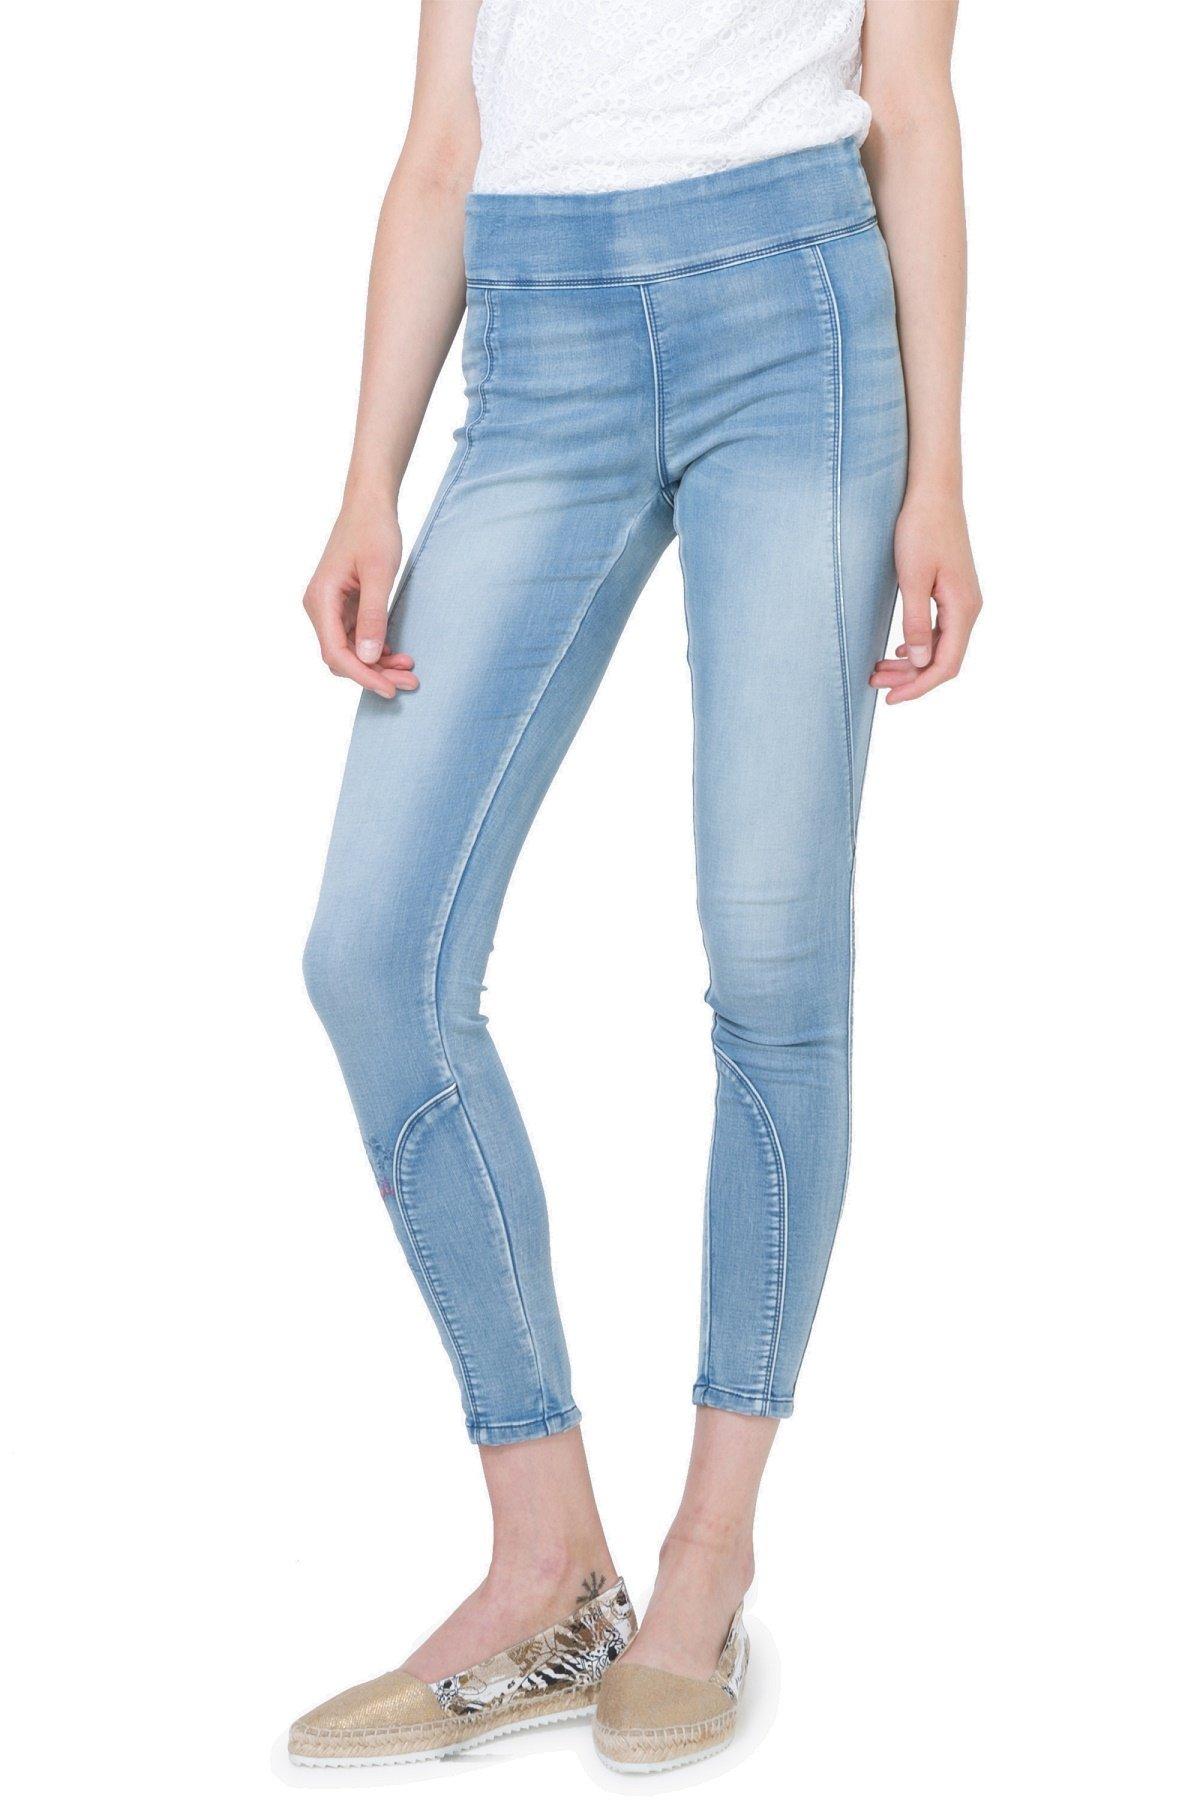 Desigual – Pantalón – para Mujer 5007 S